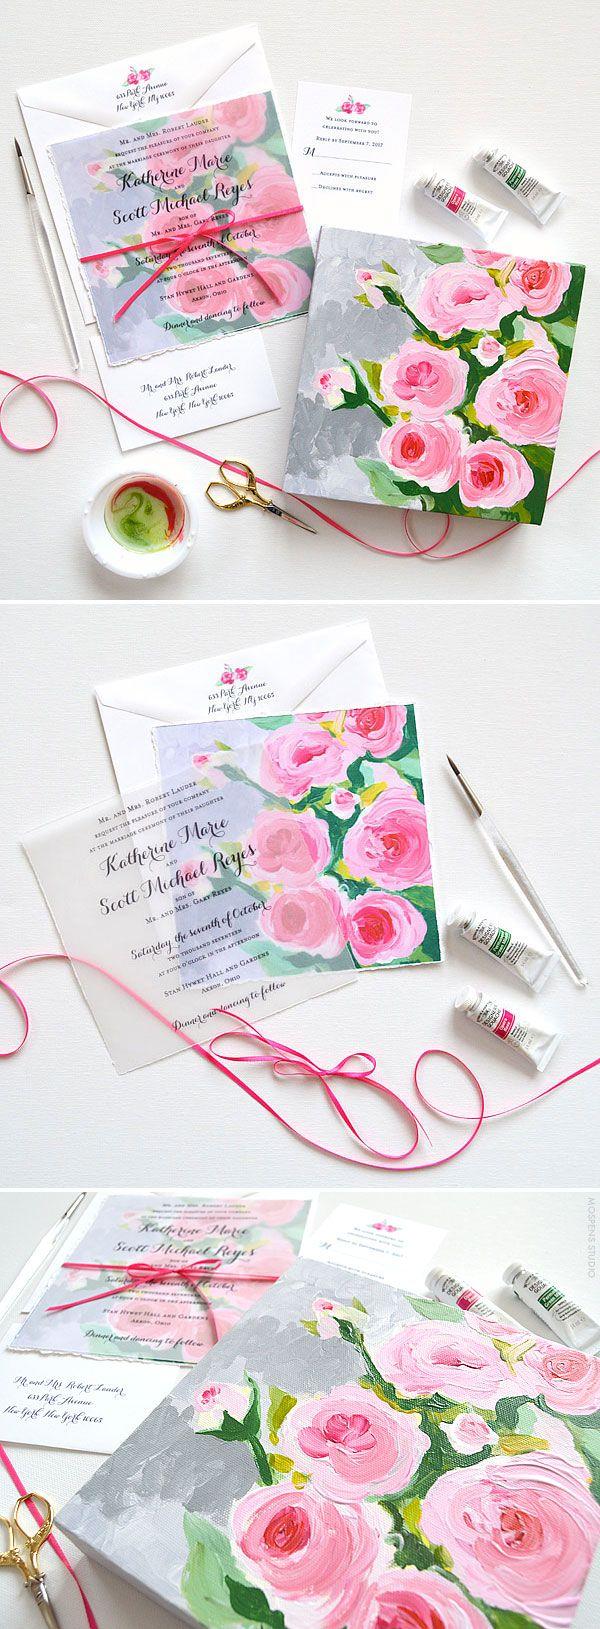 452 best Wedding Invitations images on Pinterest | Bridal ...